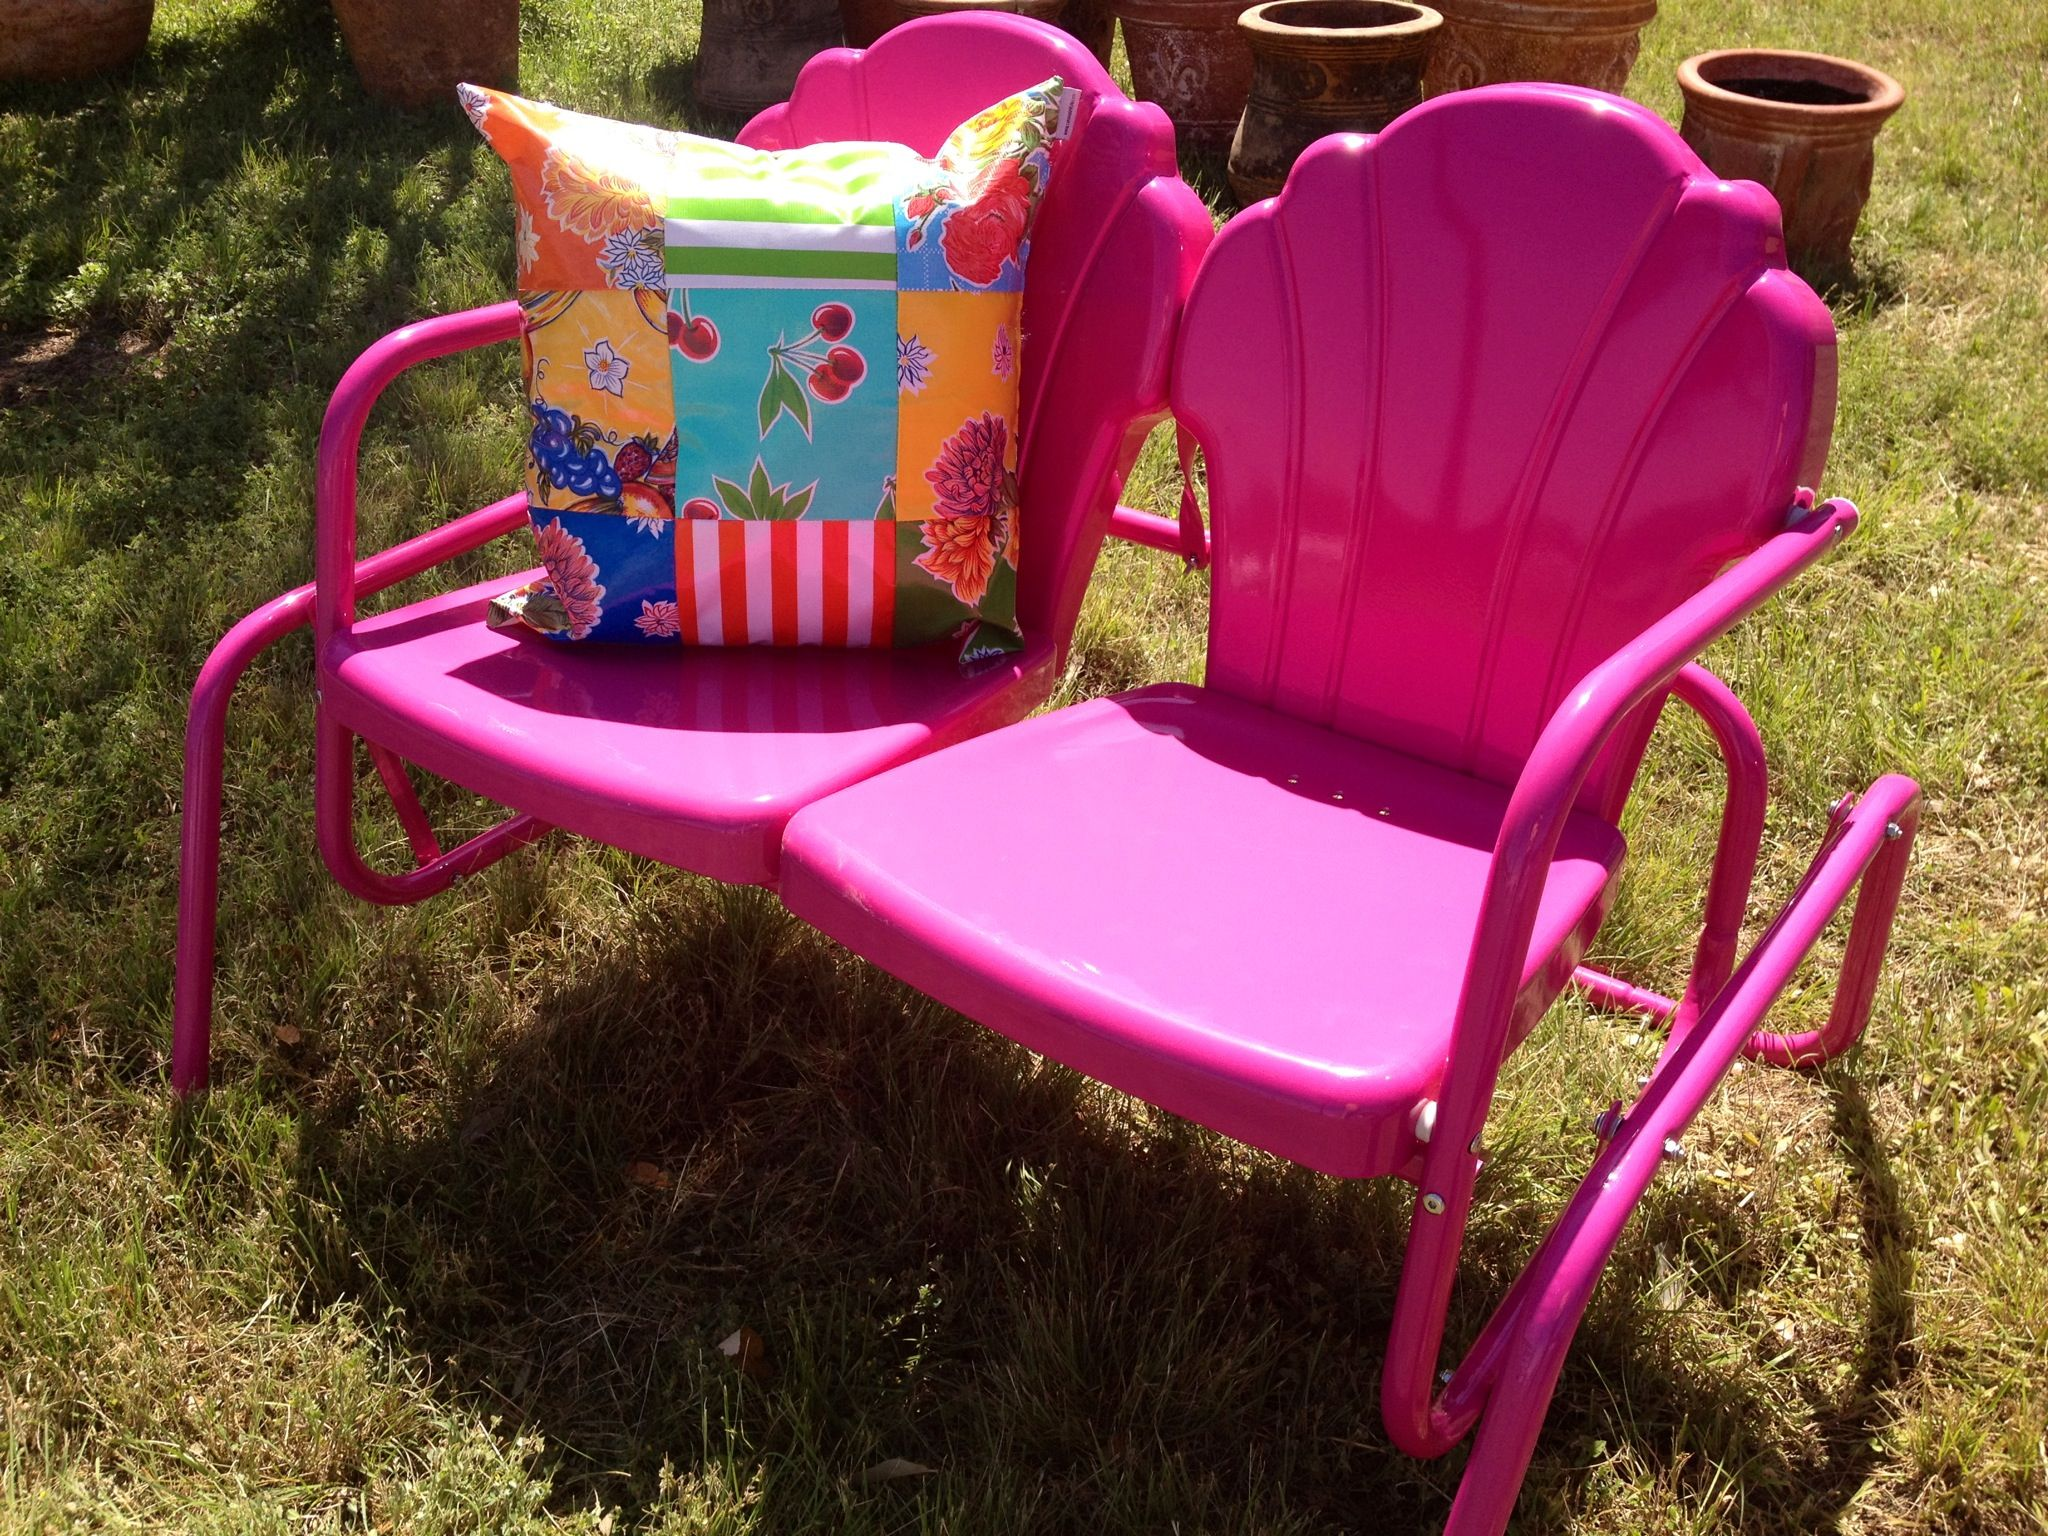 Hot Pink Retro Lawn Furniture At Nest Vintage Johnson